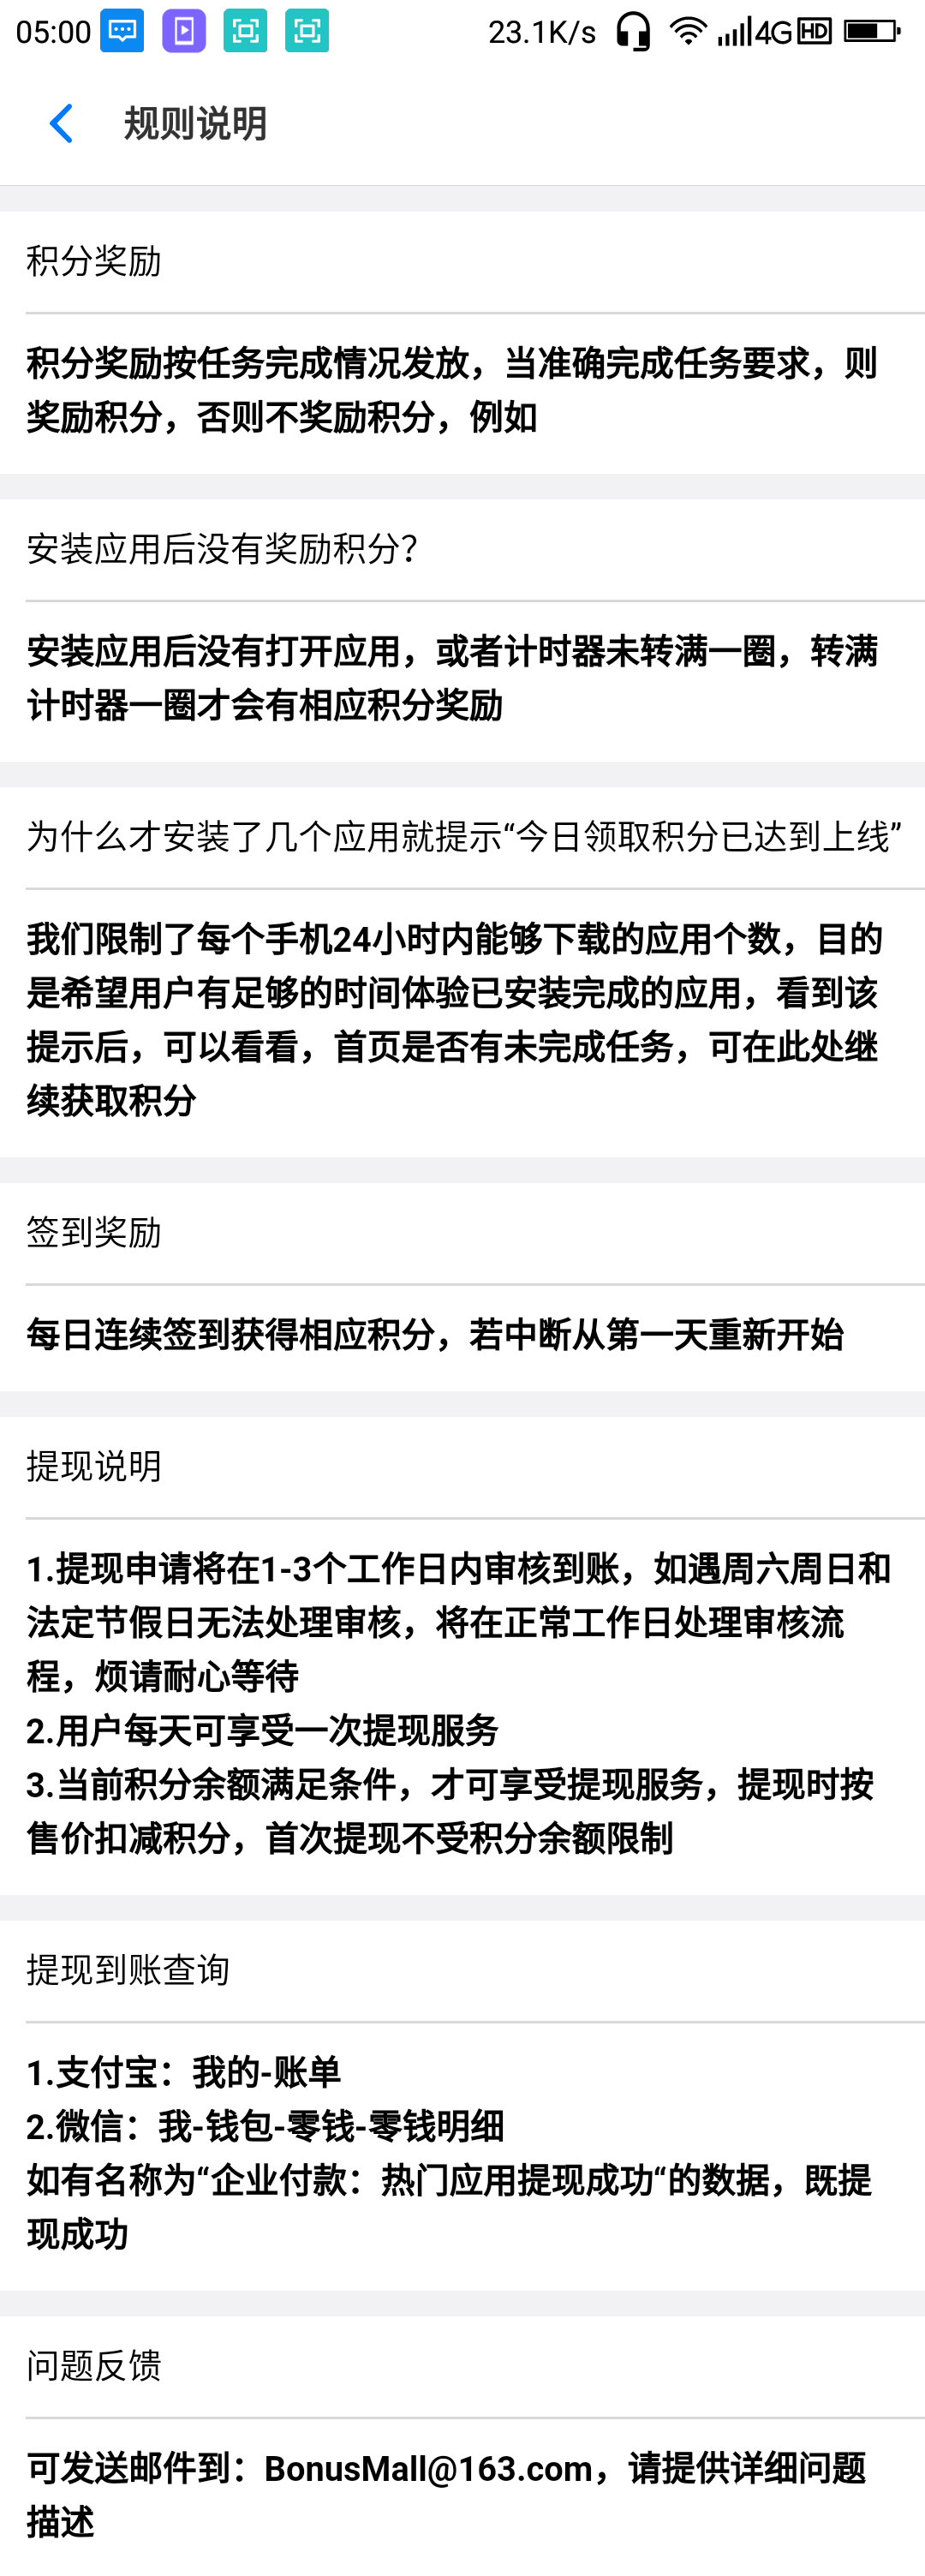 Screenshot_2020-01-19-05-00-35.png